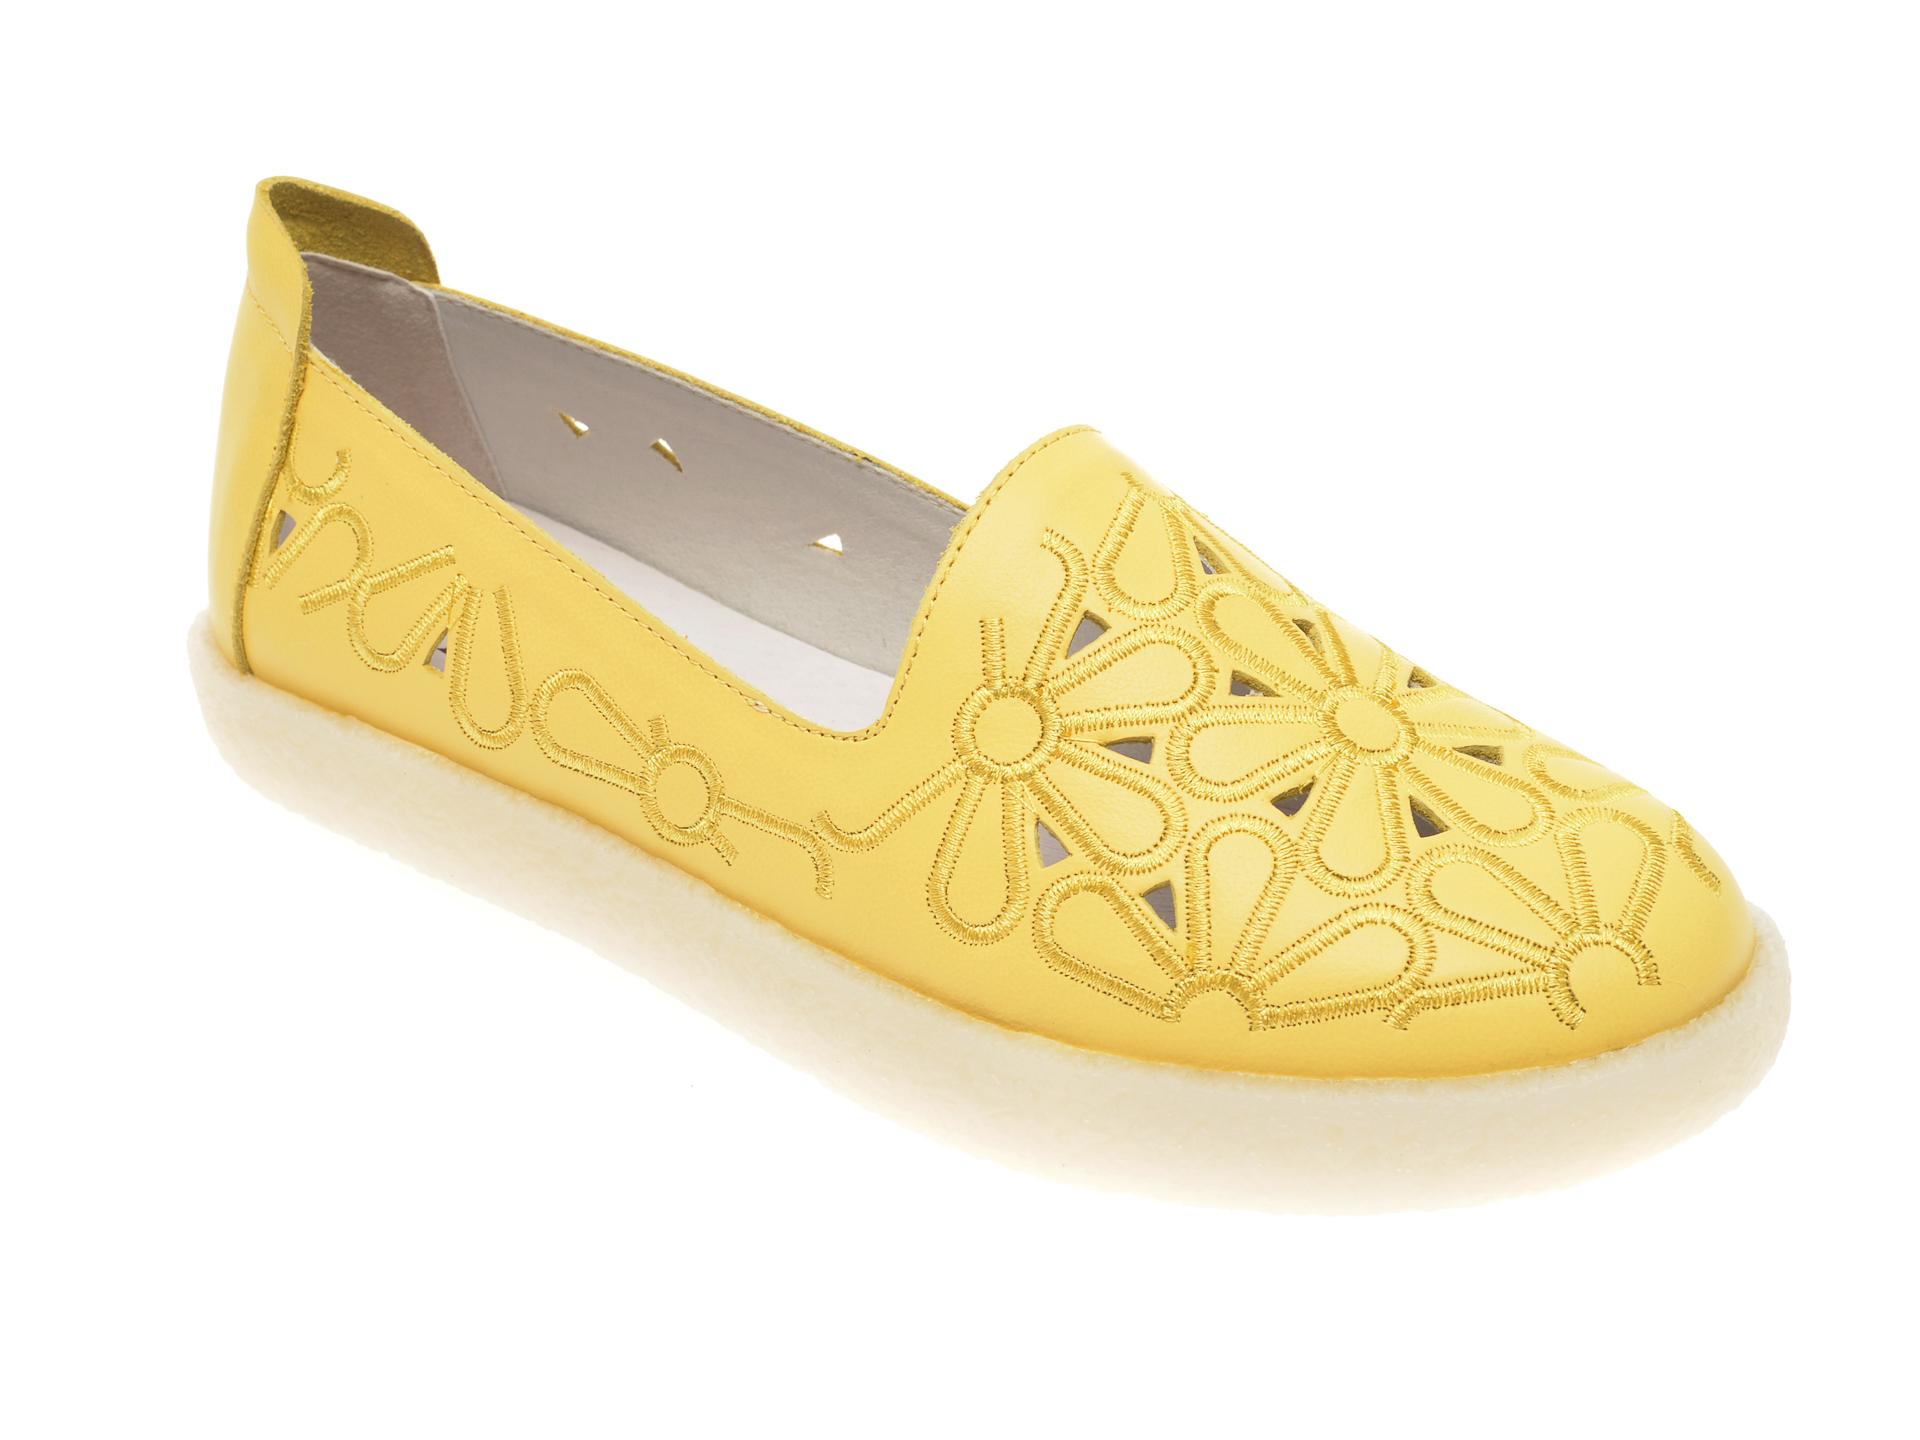 Pantofi FLAVIA PASSINI galbeni, V306G11, din piele naturala